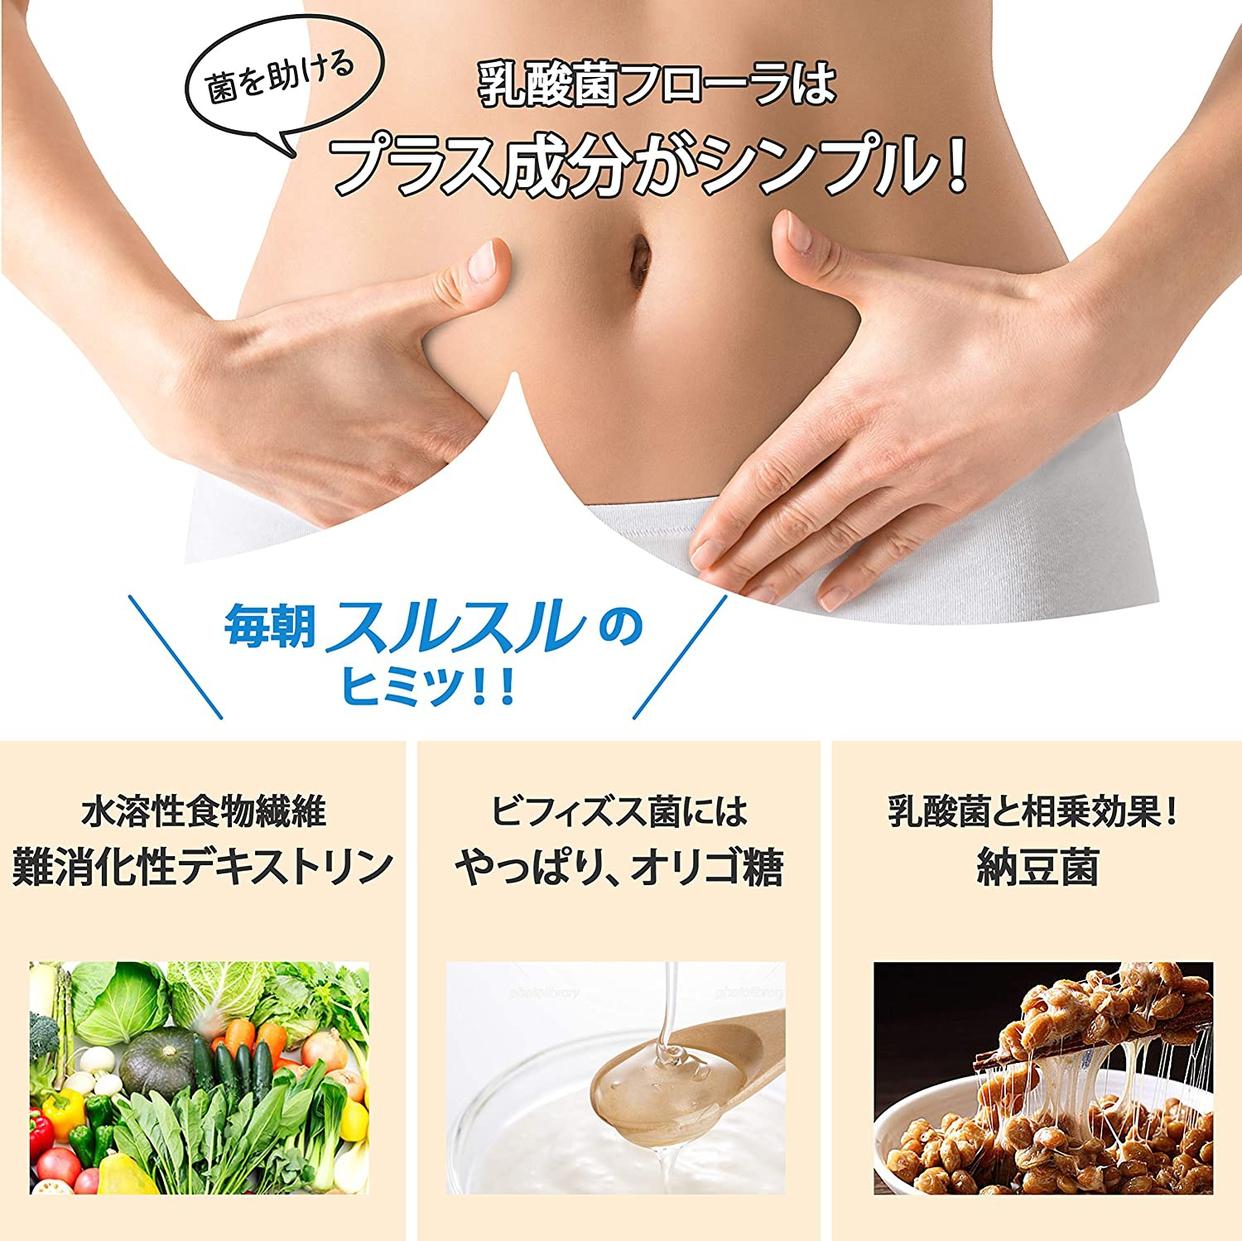 Health&co(ヘルスアンドコー) 乳酸菌 フローラの商品画像5